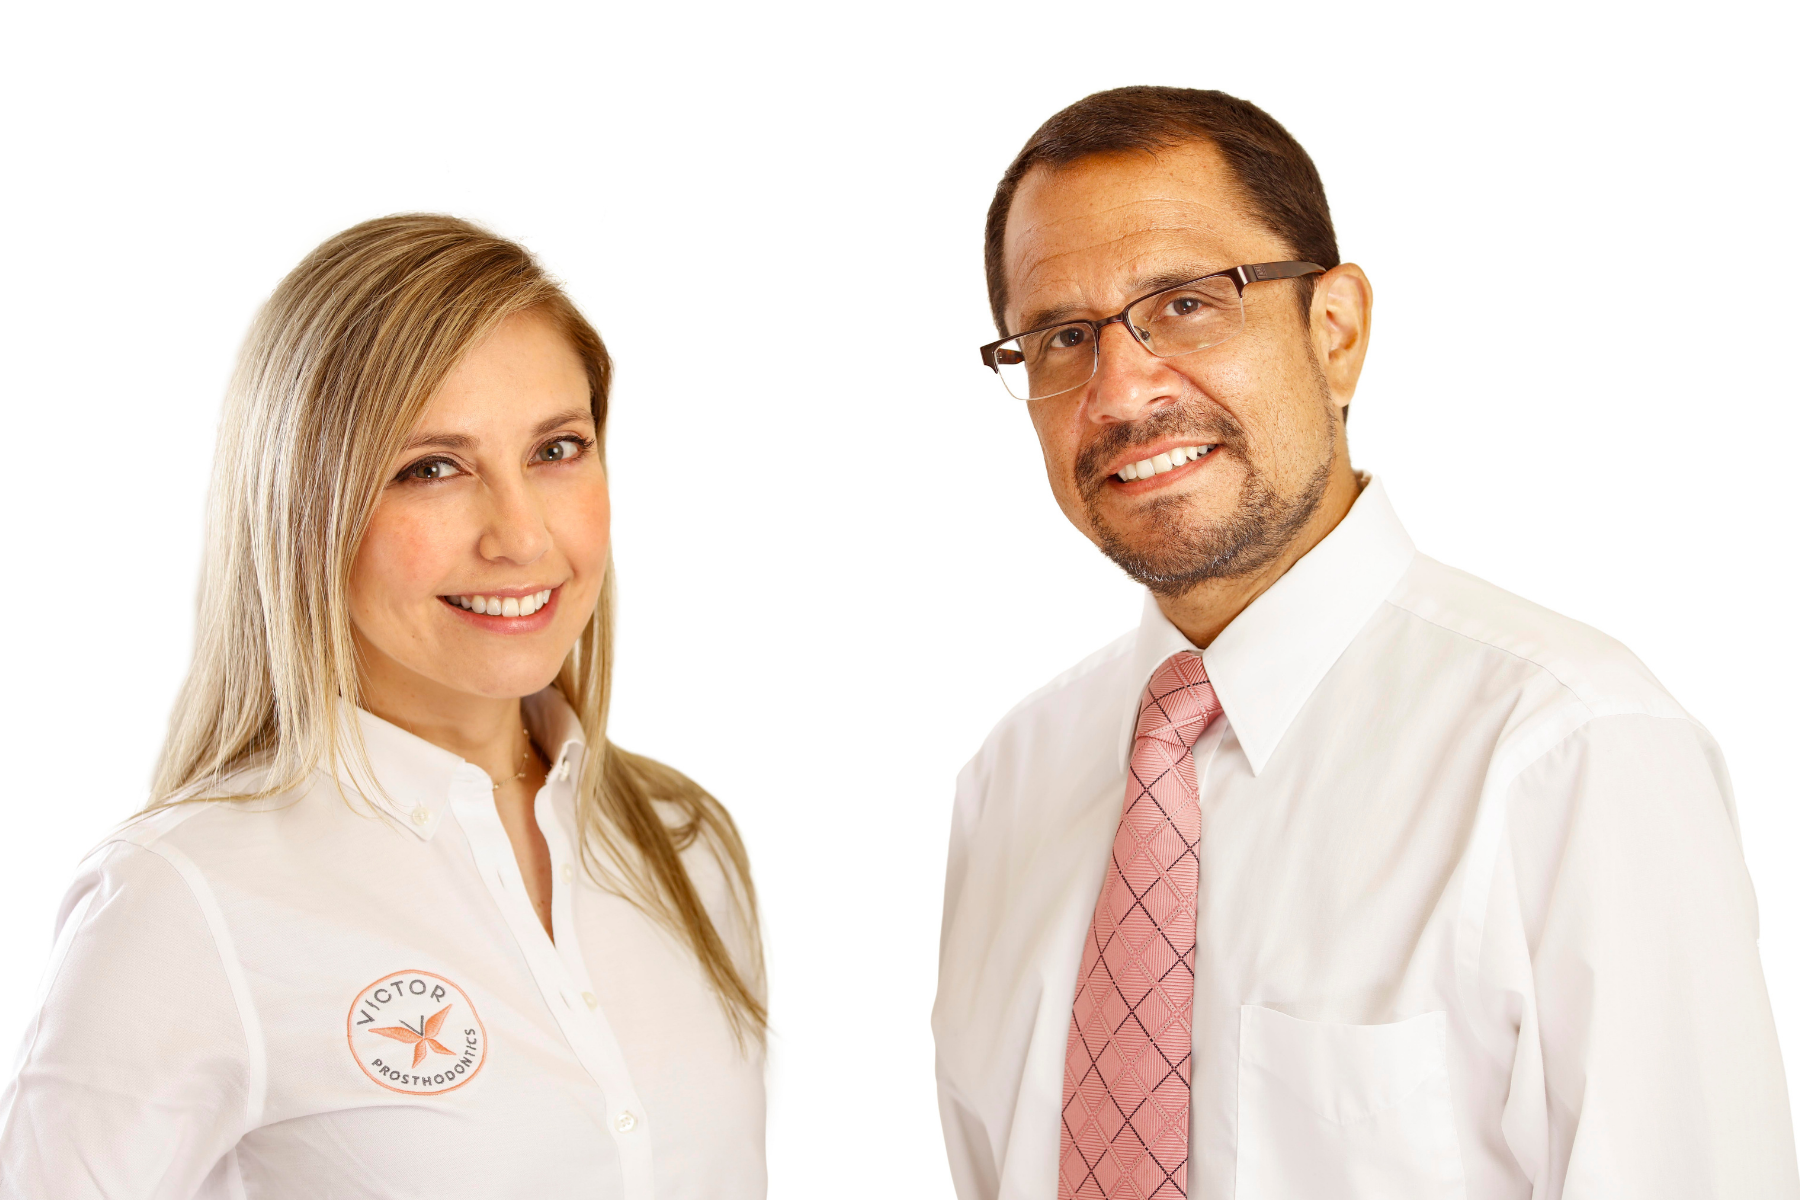 Victor Prosthodontics - Staff Prosthodontists